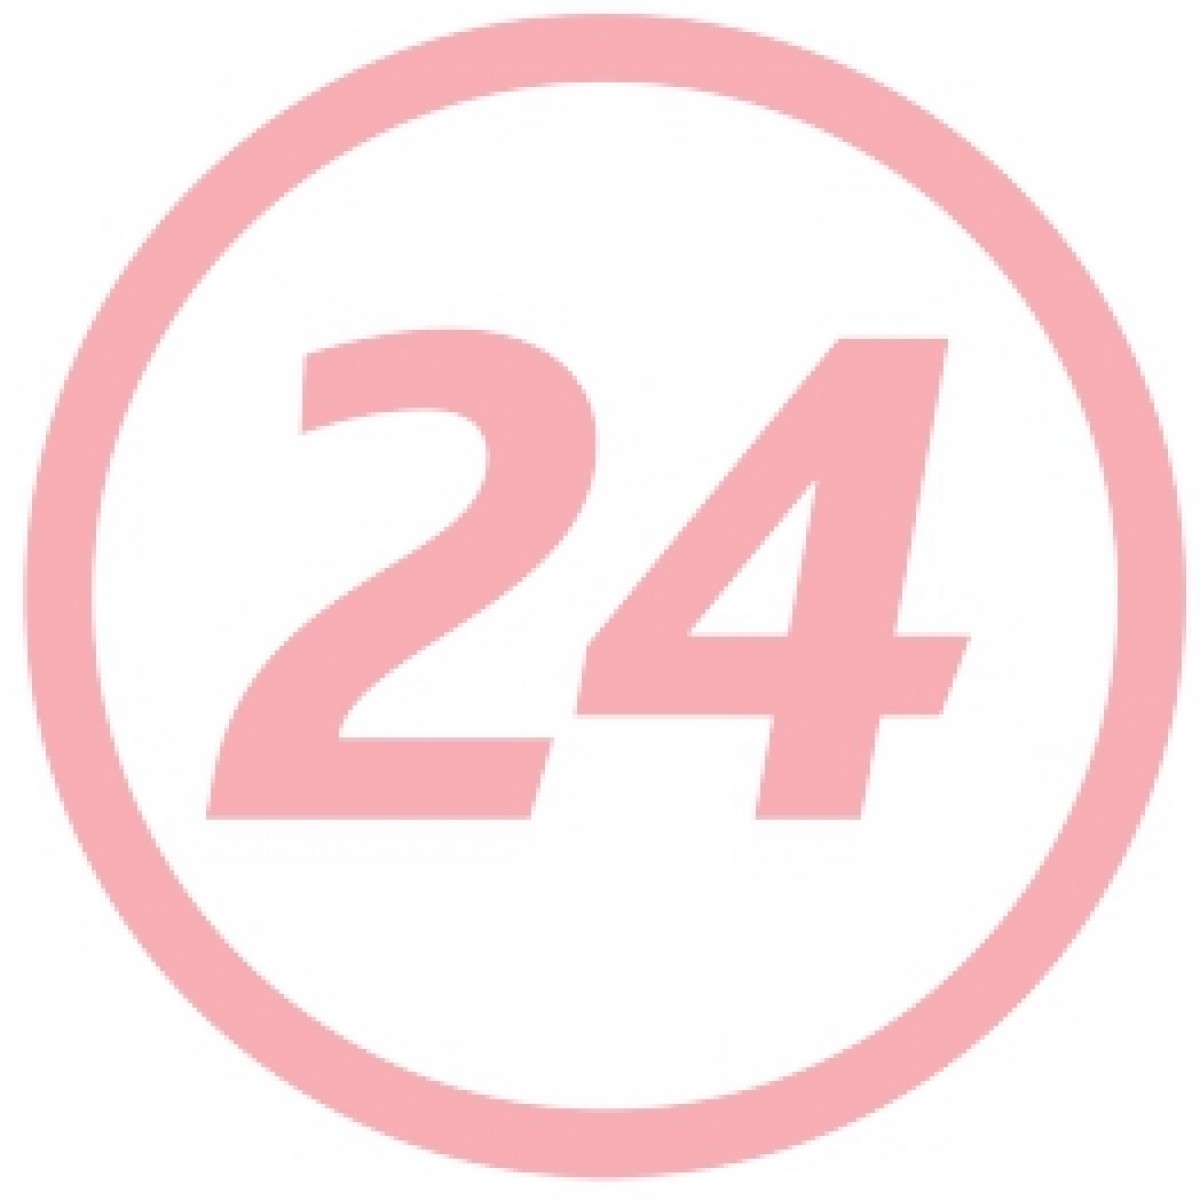 Avent Set 2 Castroane Cu Baza Antialunecare +6 Luni, Castroane, 2buc